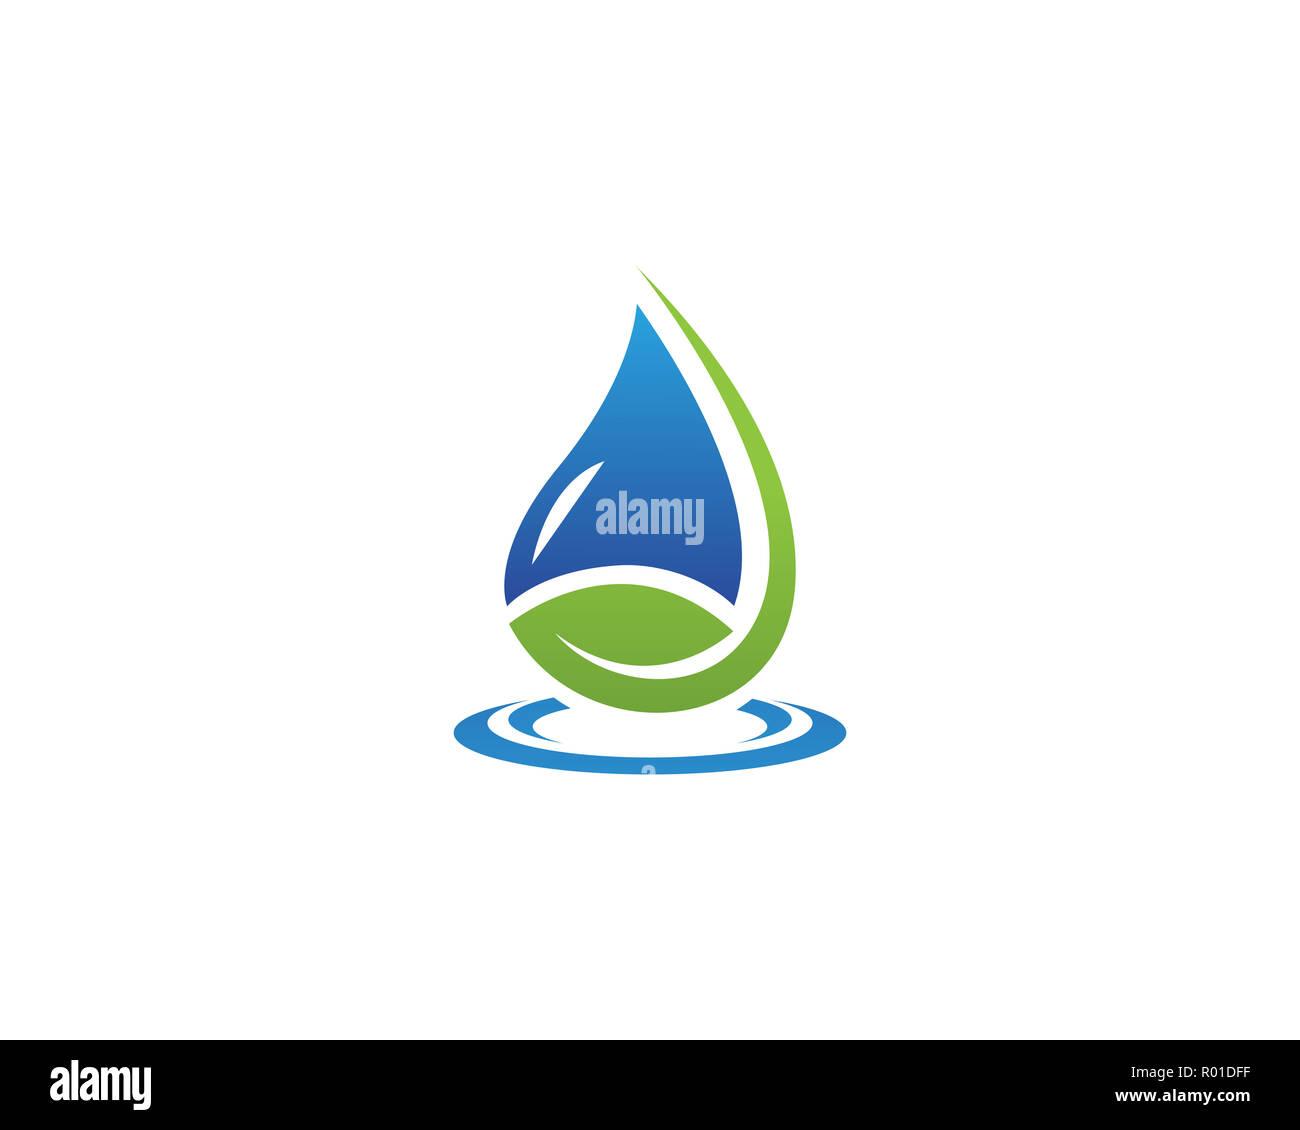 Water drops logo vector - Stock Image